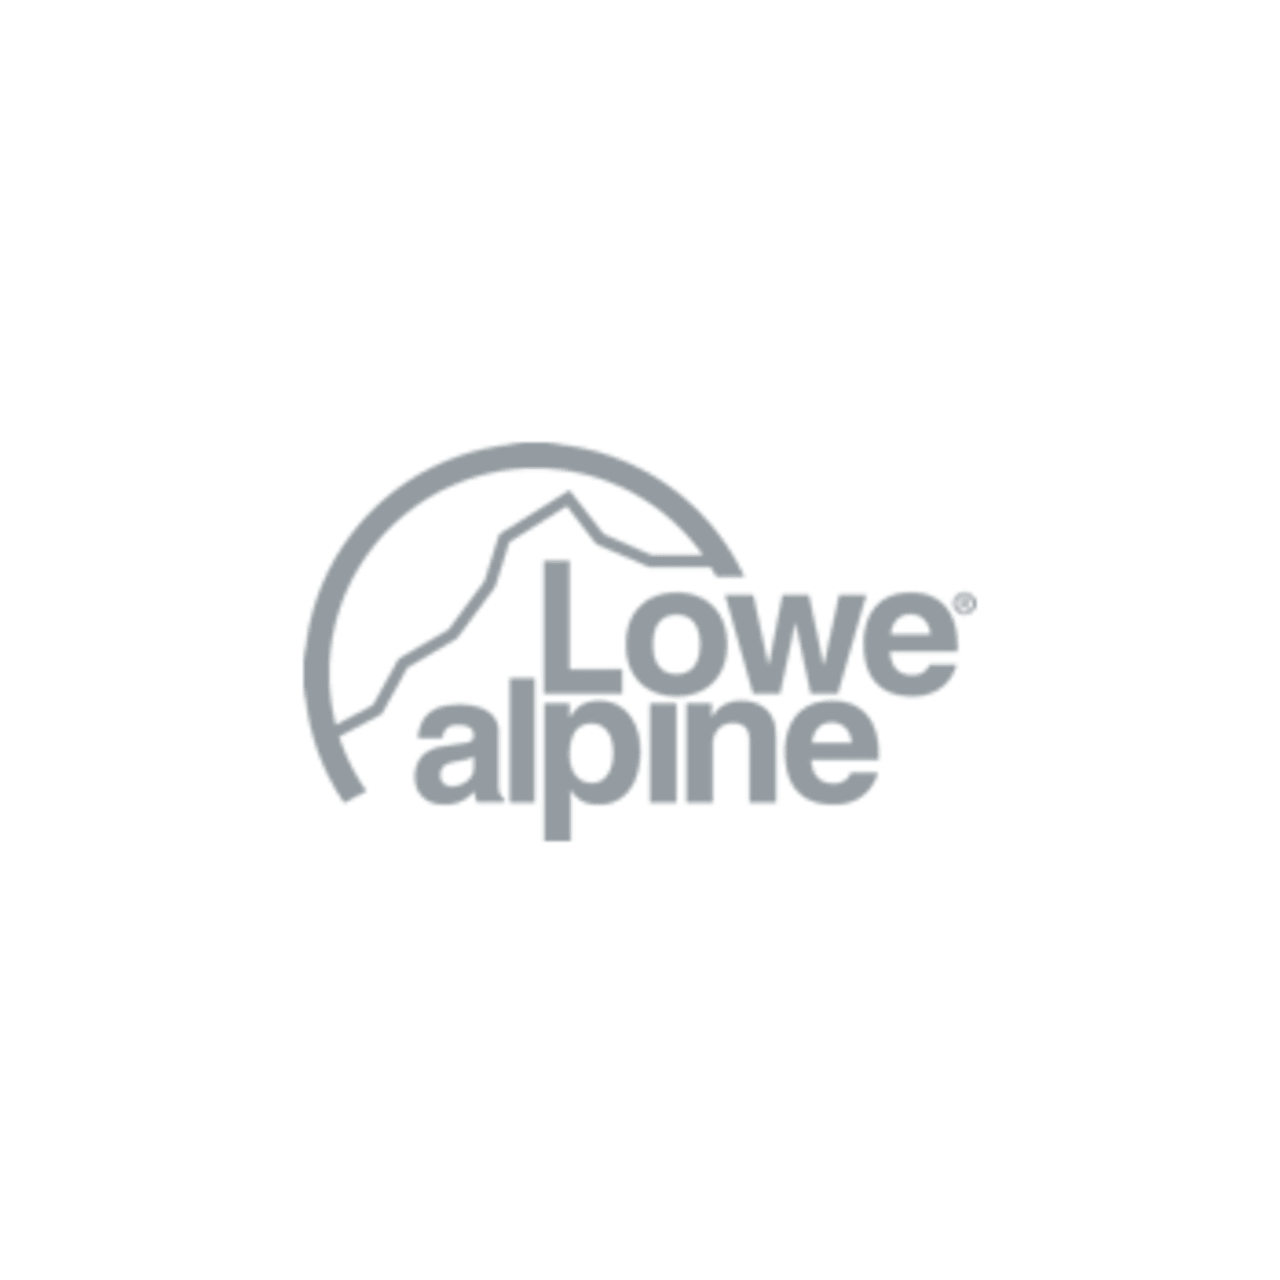 LOGO LOWE